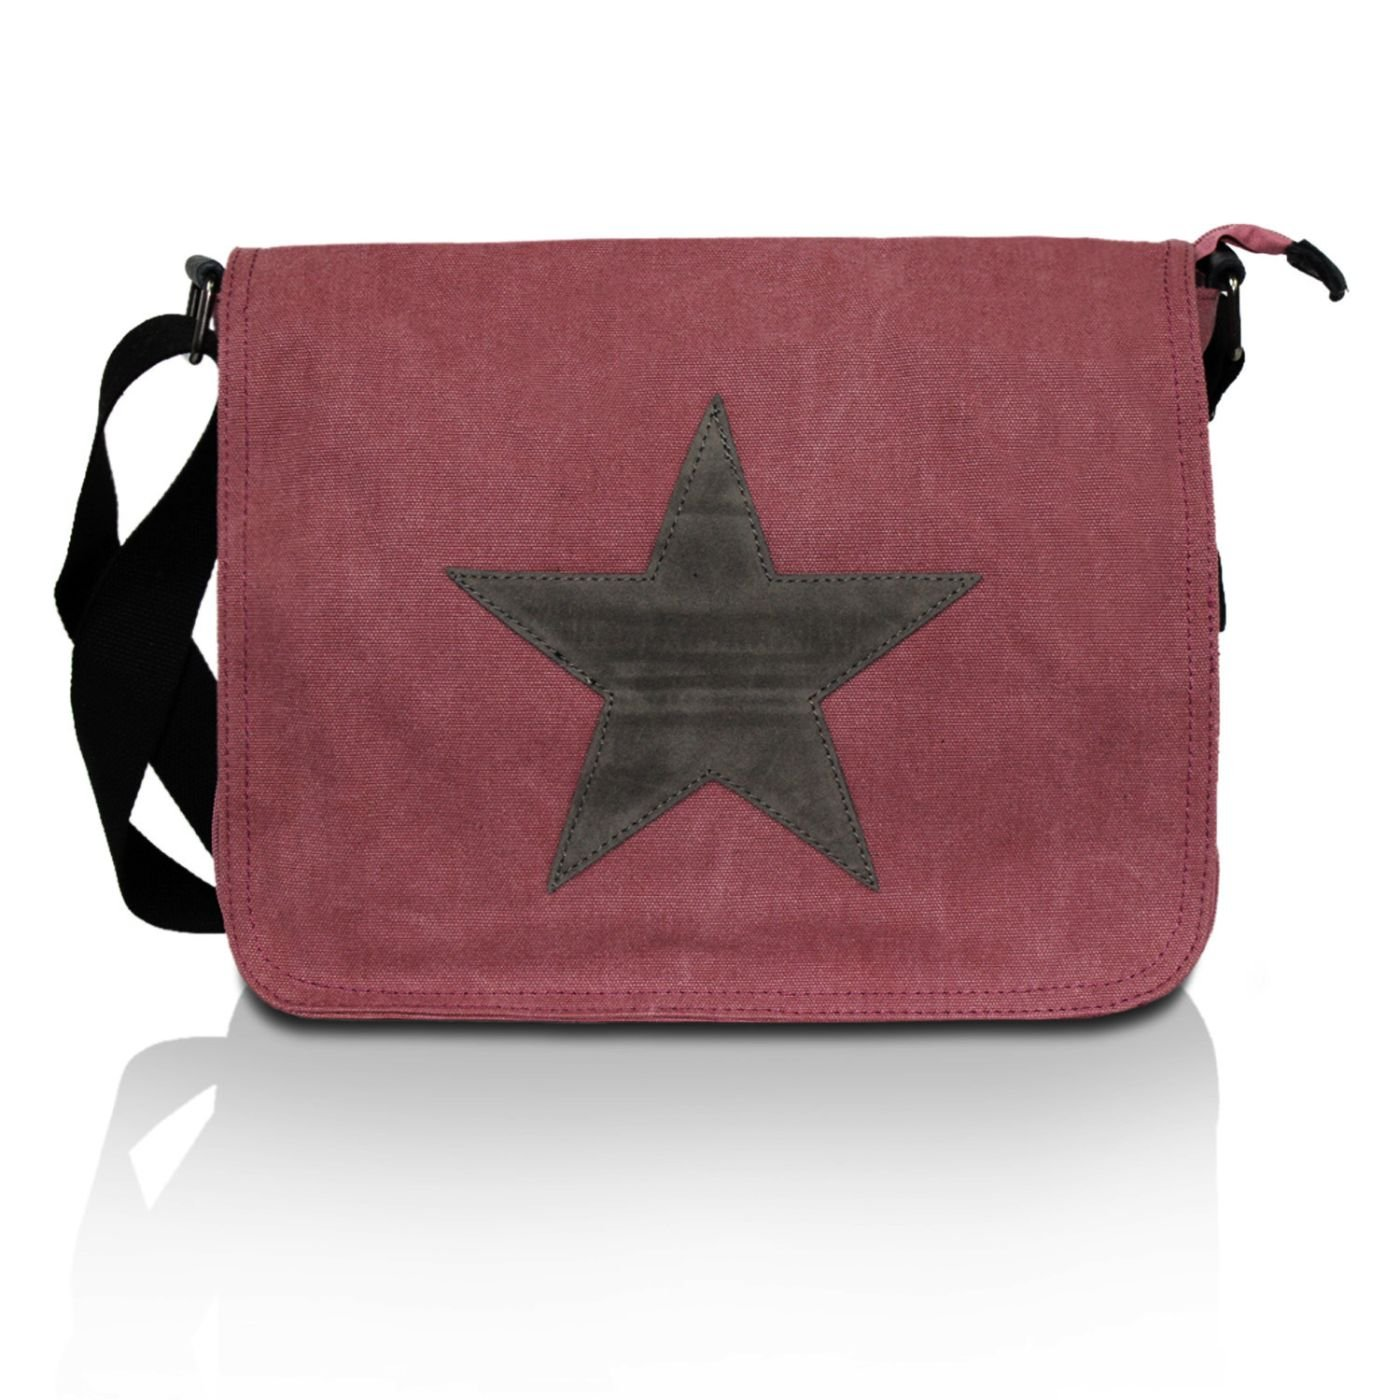 Glamexx24 Sacs sac à bandoulière sac à bandoulière sac à bandoulière avec sac de transport motif étoile